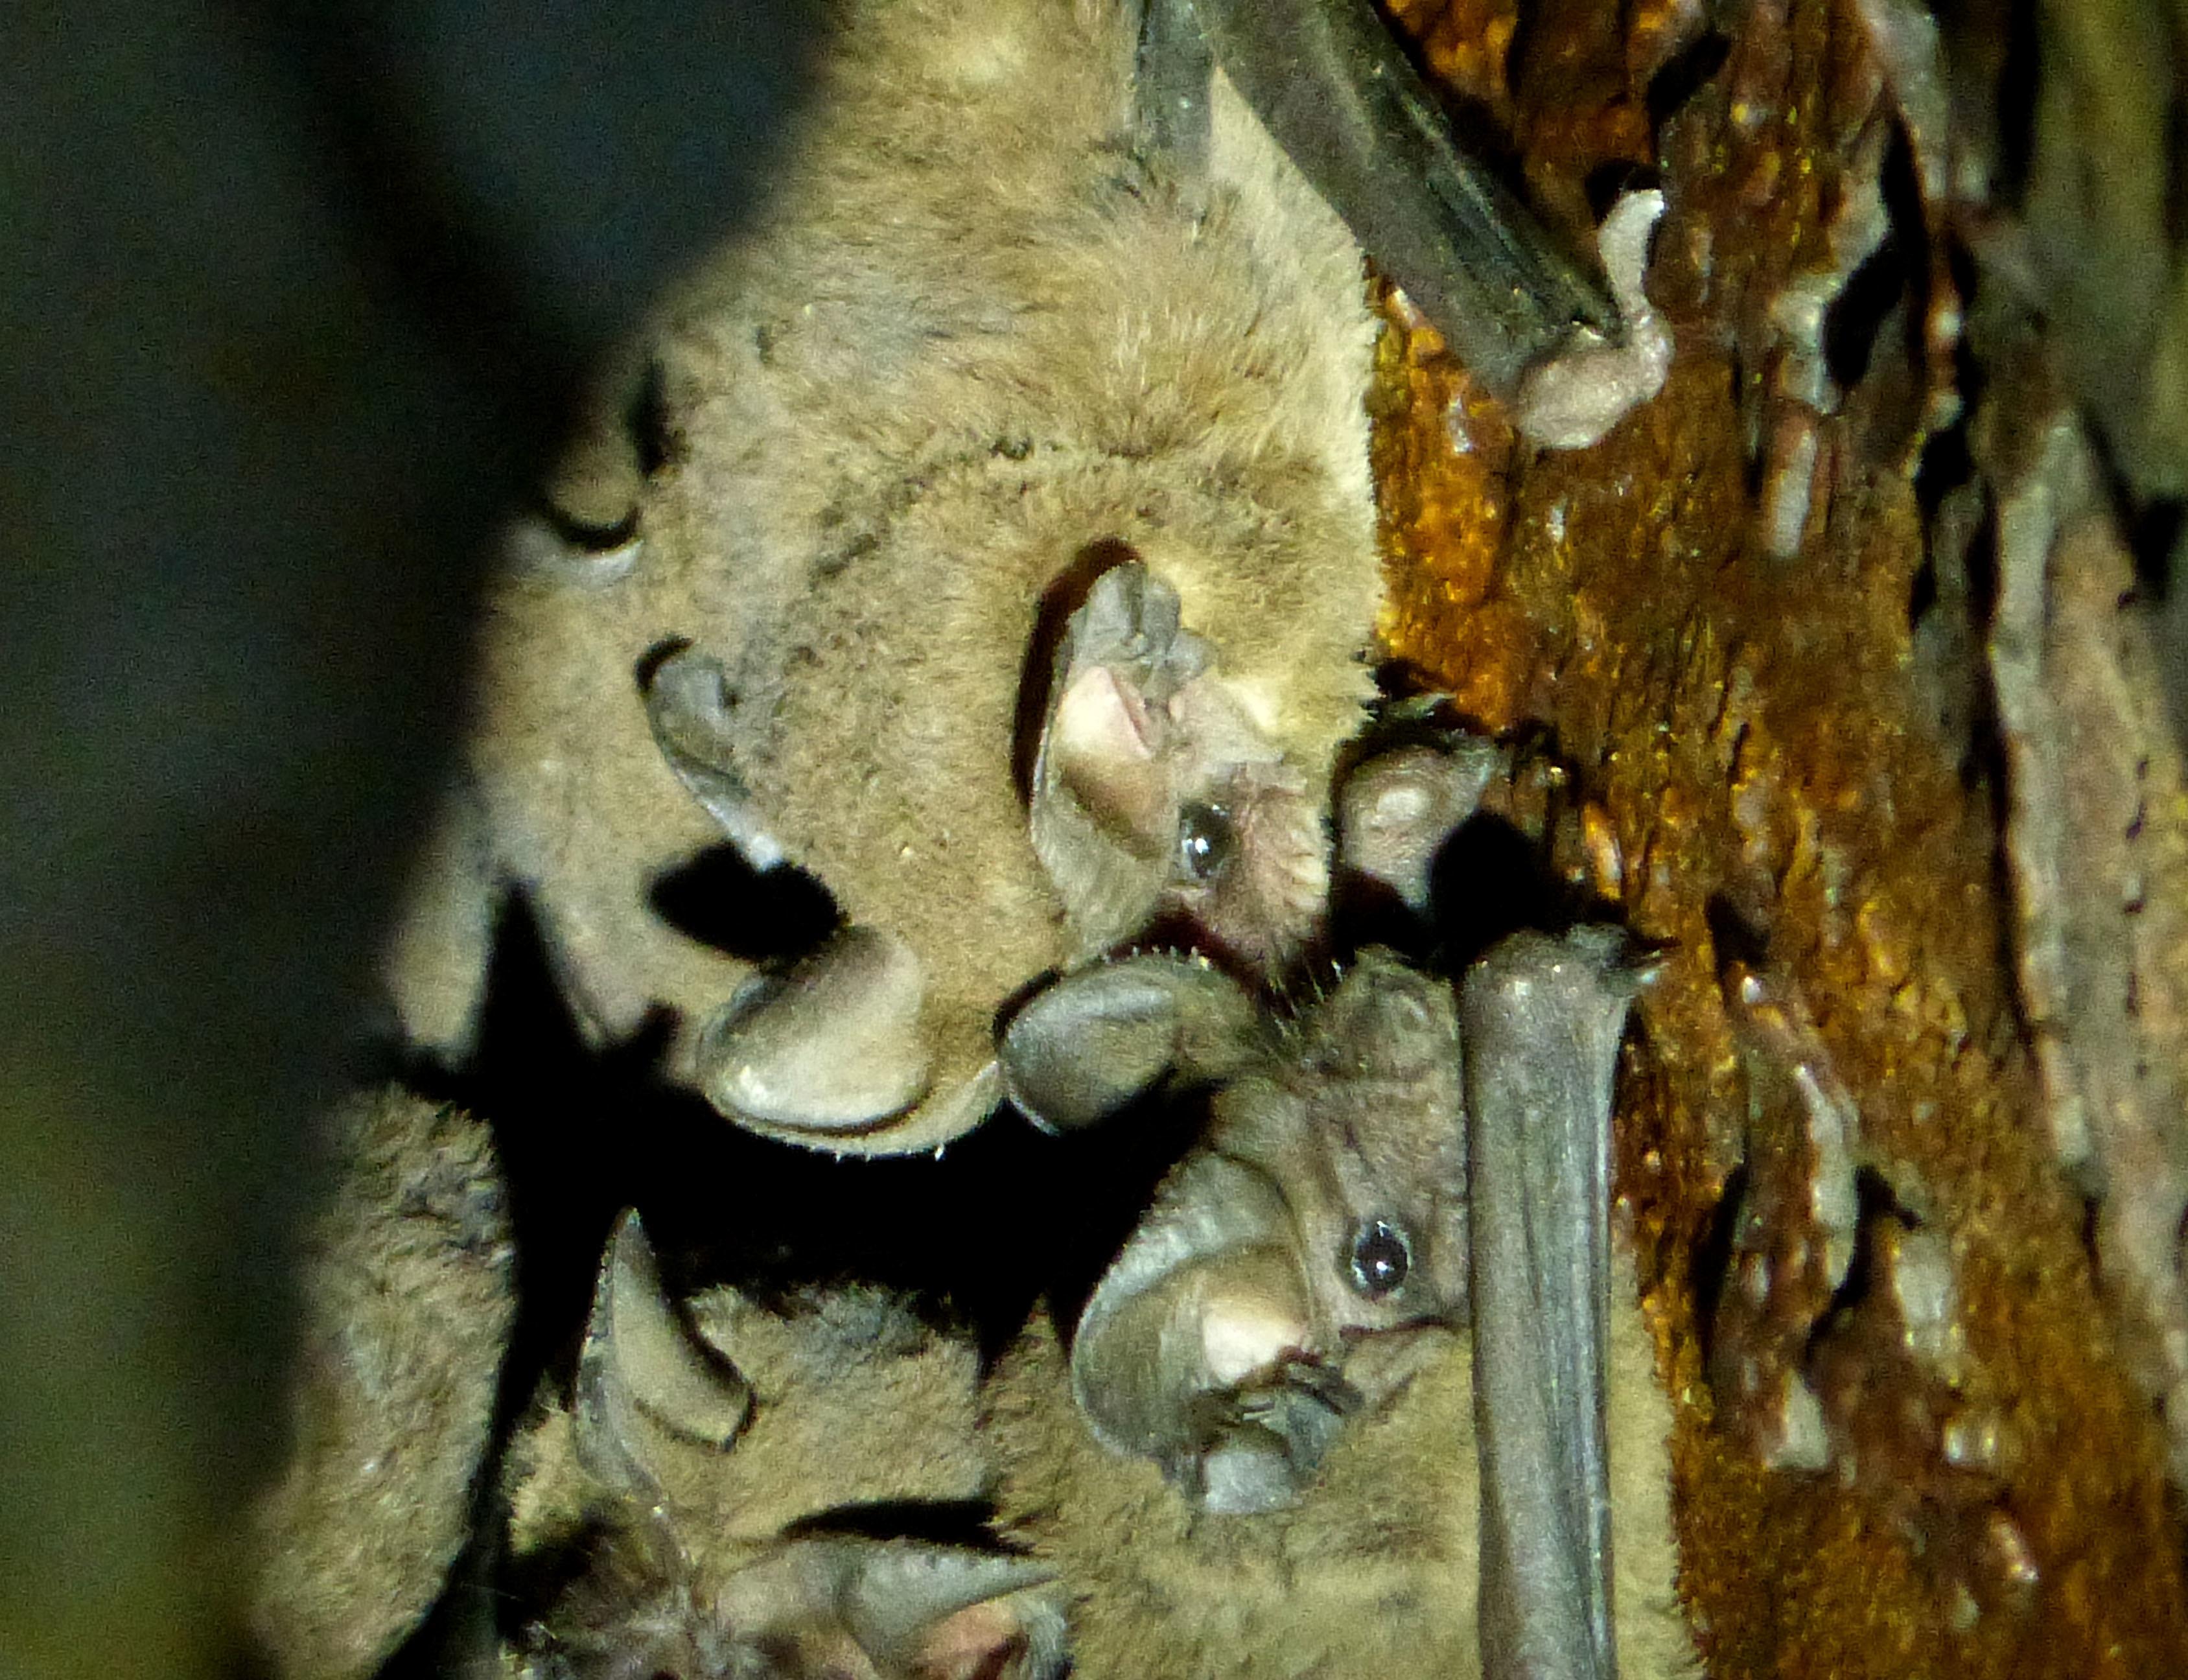 Image of Cuban Funnel-eared Bat